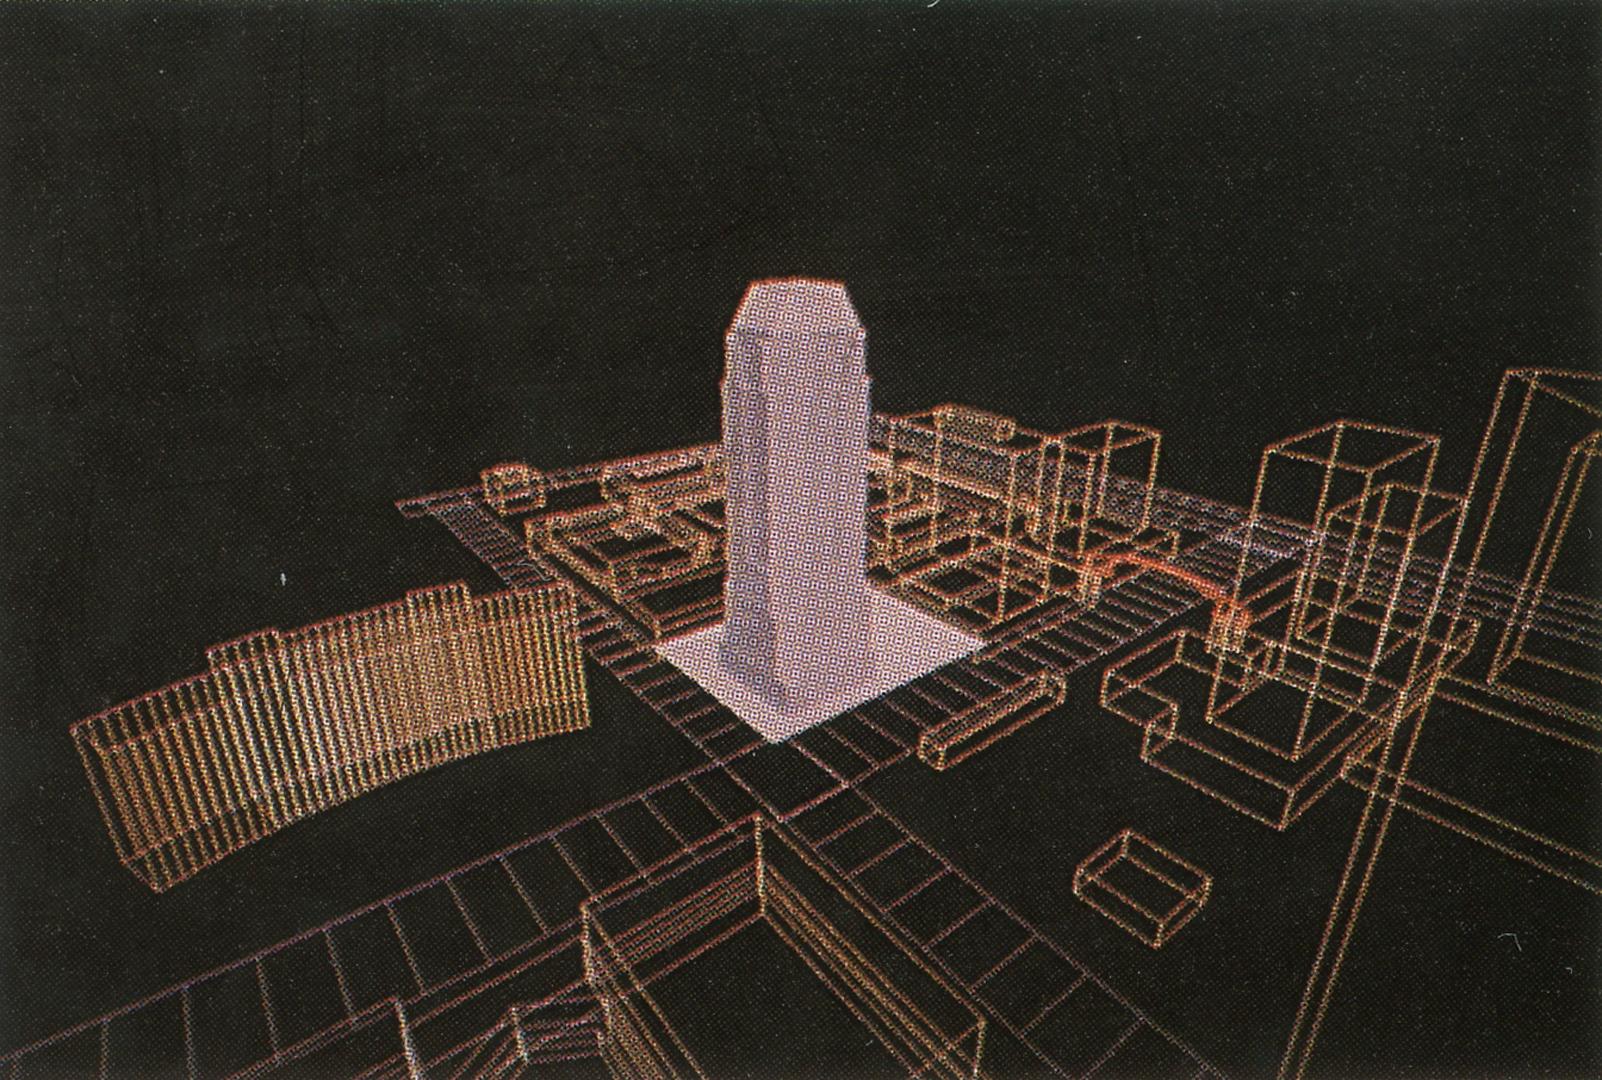 ©, Welton Beckett Associates, Century City